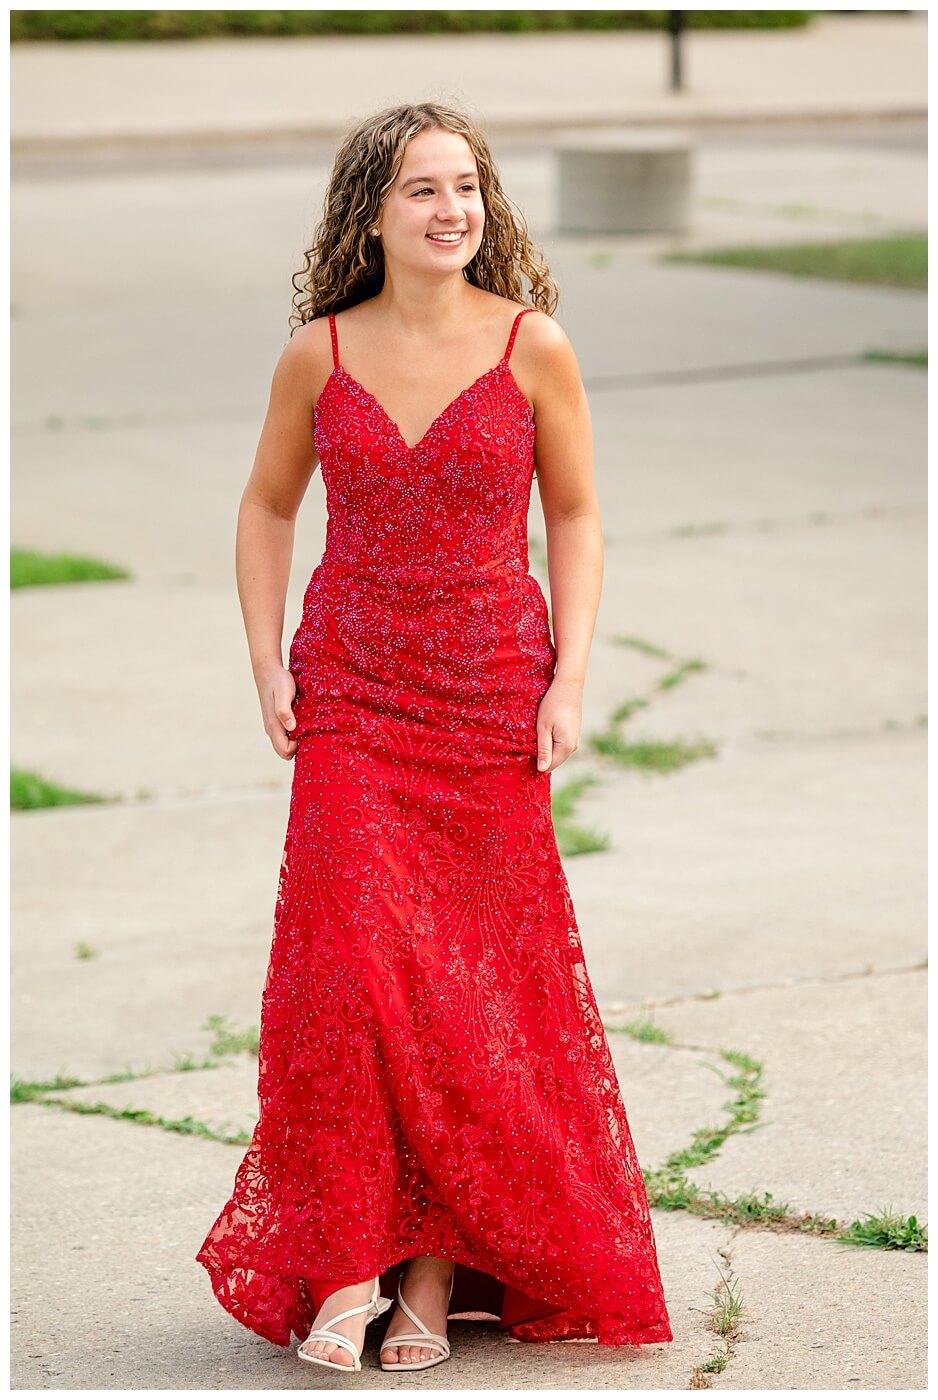 Cailey Baseden - Graduation 2021 - 01 - High school senior in red dress